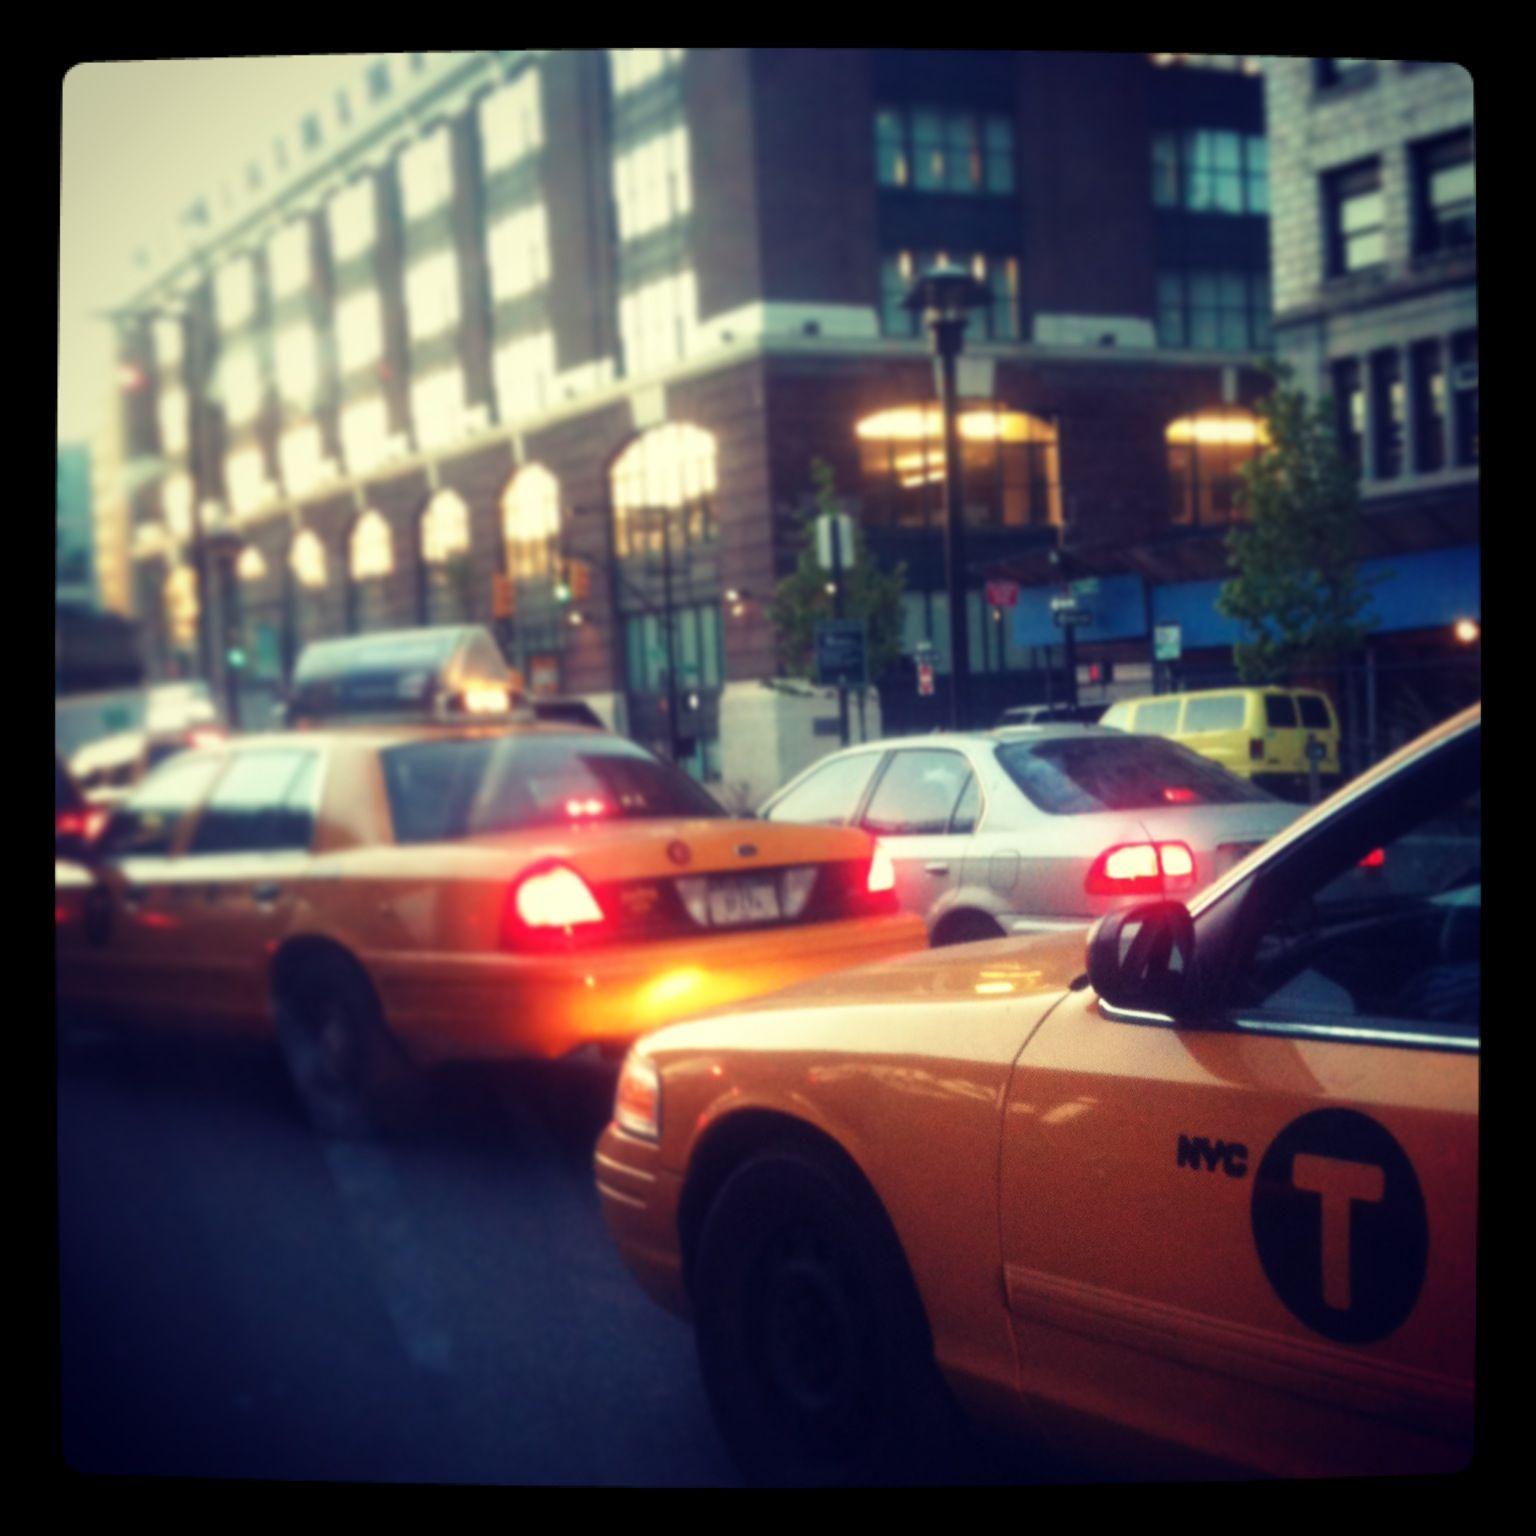 StartNewYork #nyc #usa #newyork #taxi #traffic #yellow #cab